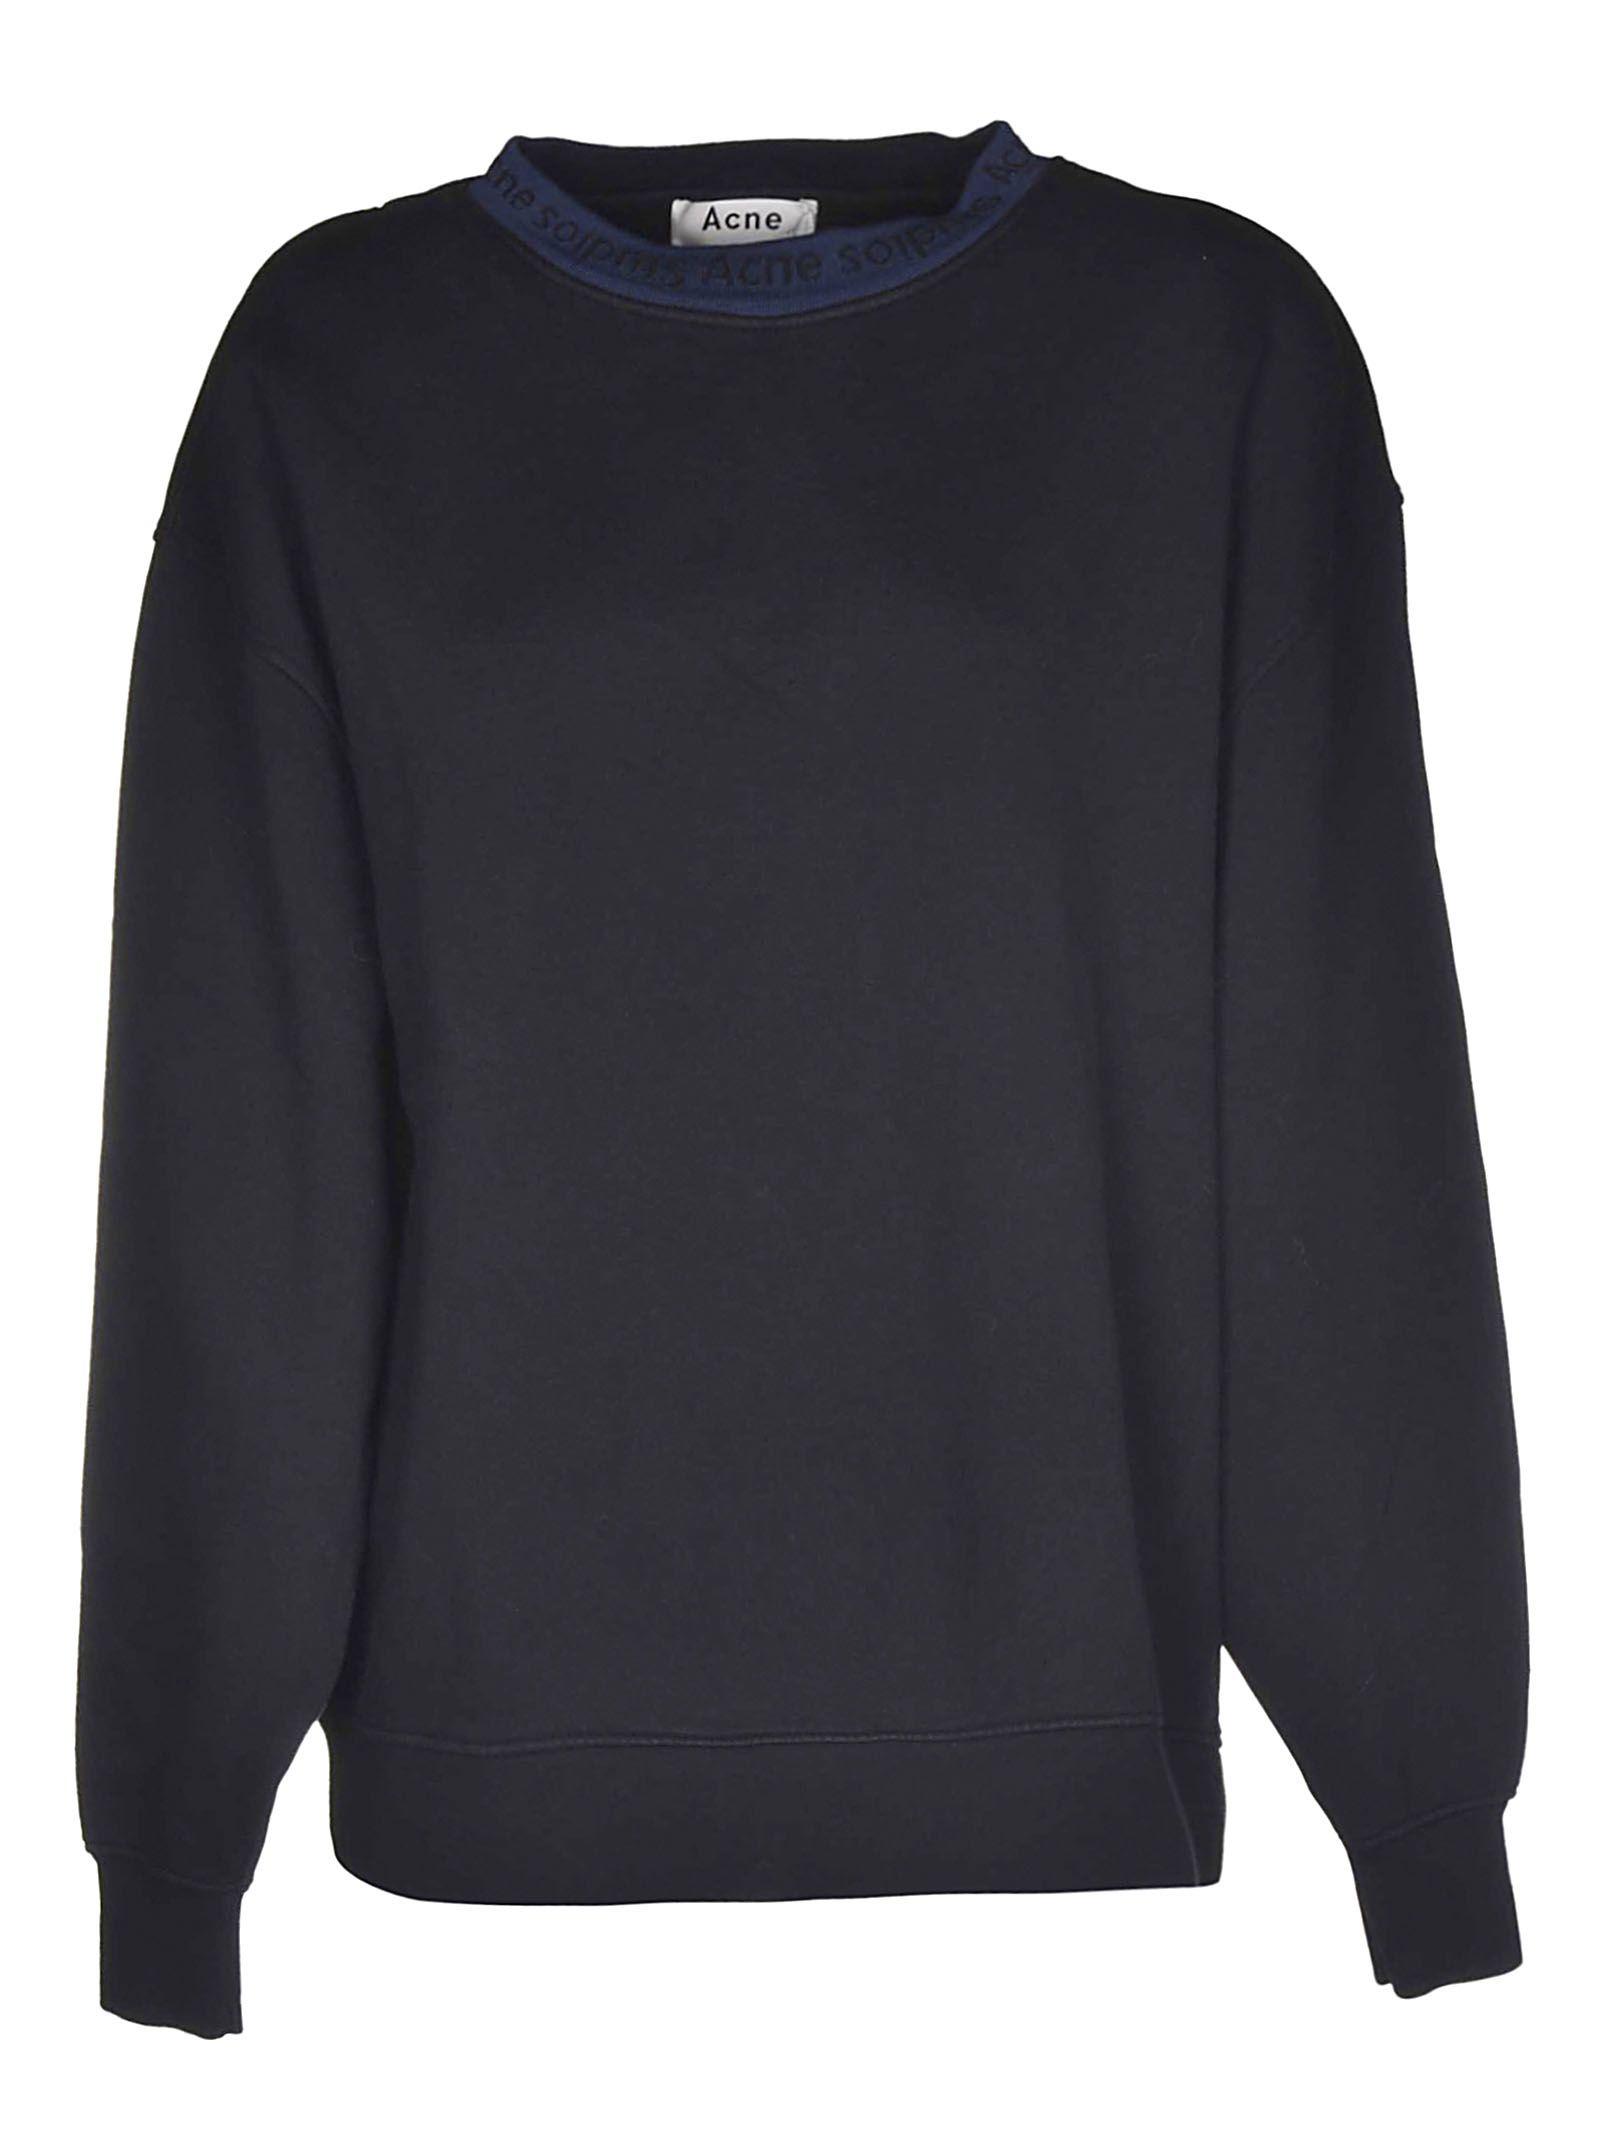 Acne Studios | Acne Studios Oversized Sweater | Clouty